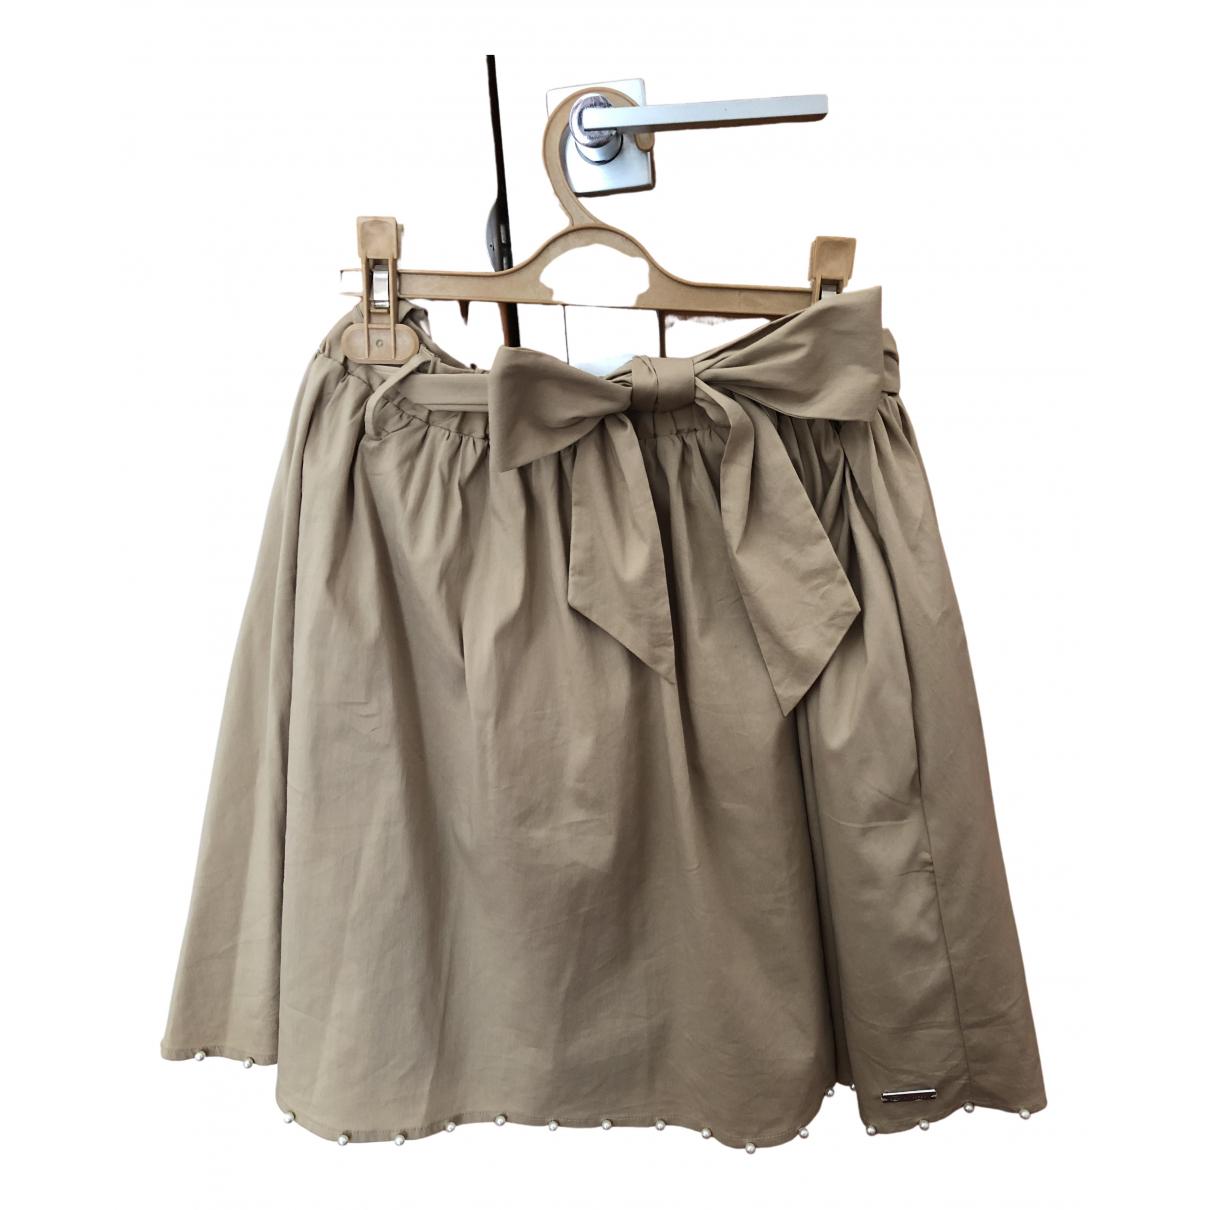 Twin Set \N Ecru Cotton skirt for Kids 16 years - M FR